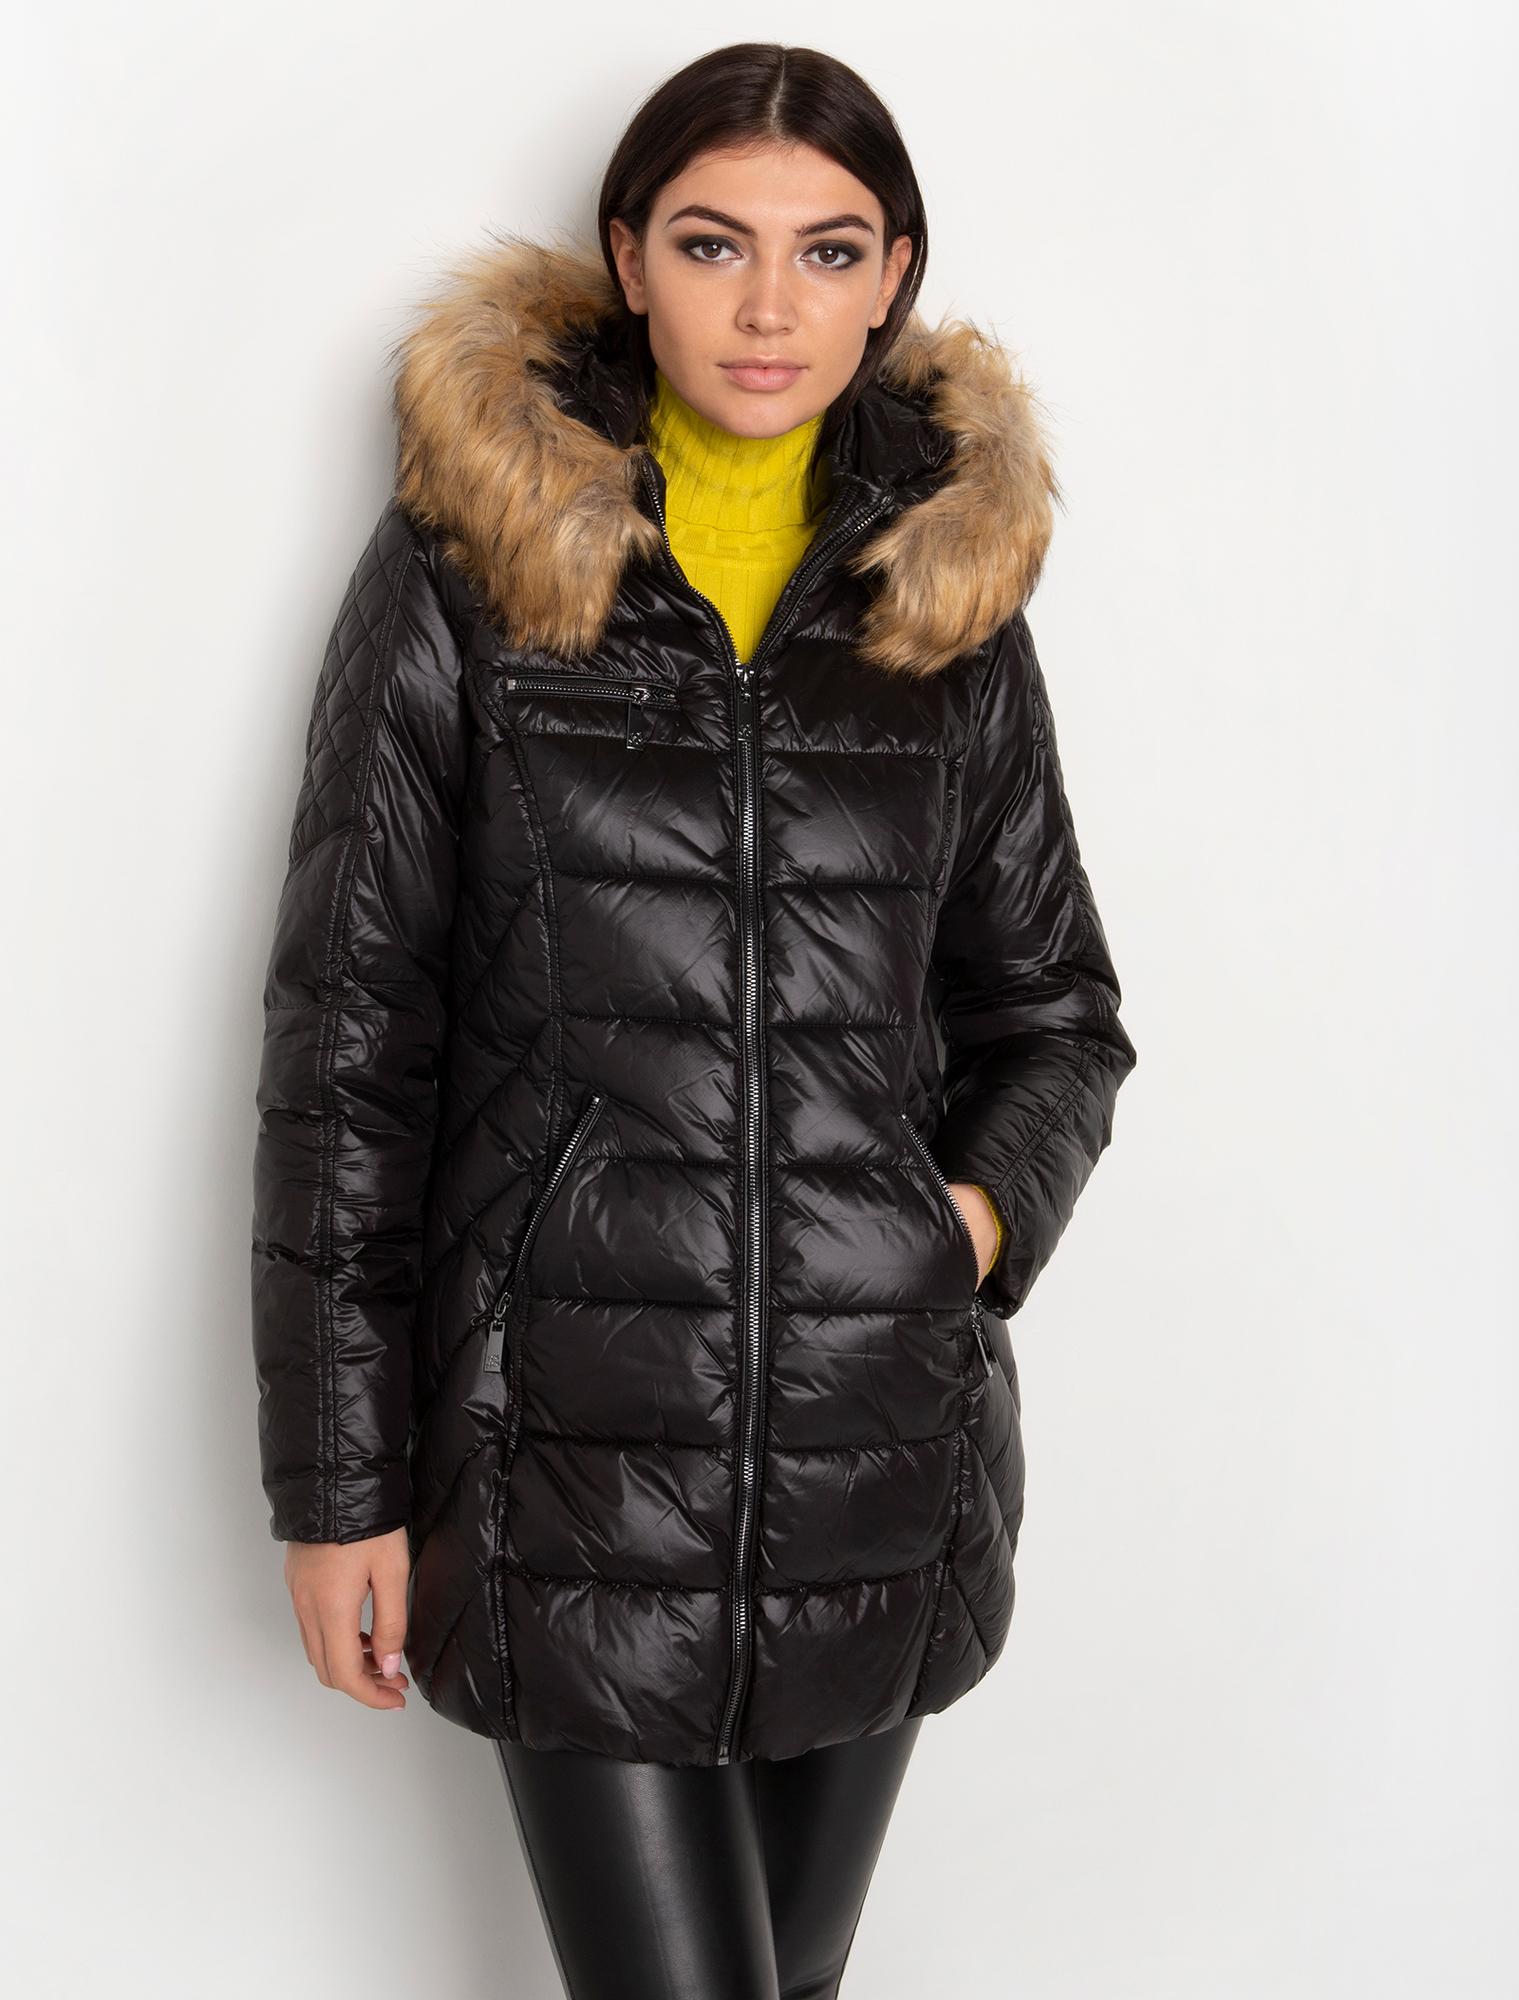 Puffer μπουφάν μακρύ με faux γούνινη κουκούλα - ΜΑΥΡΟ